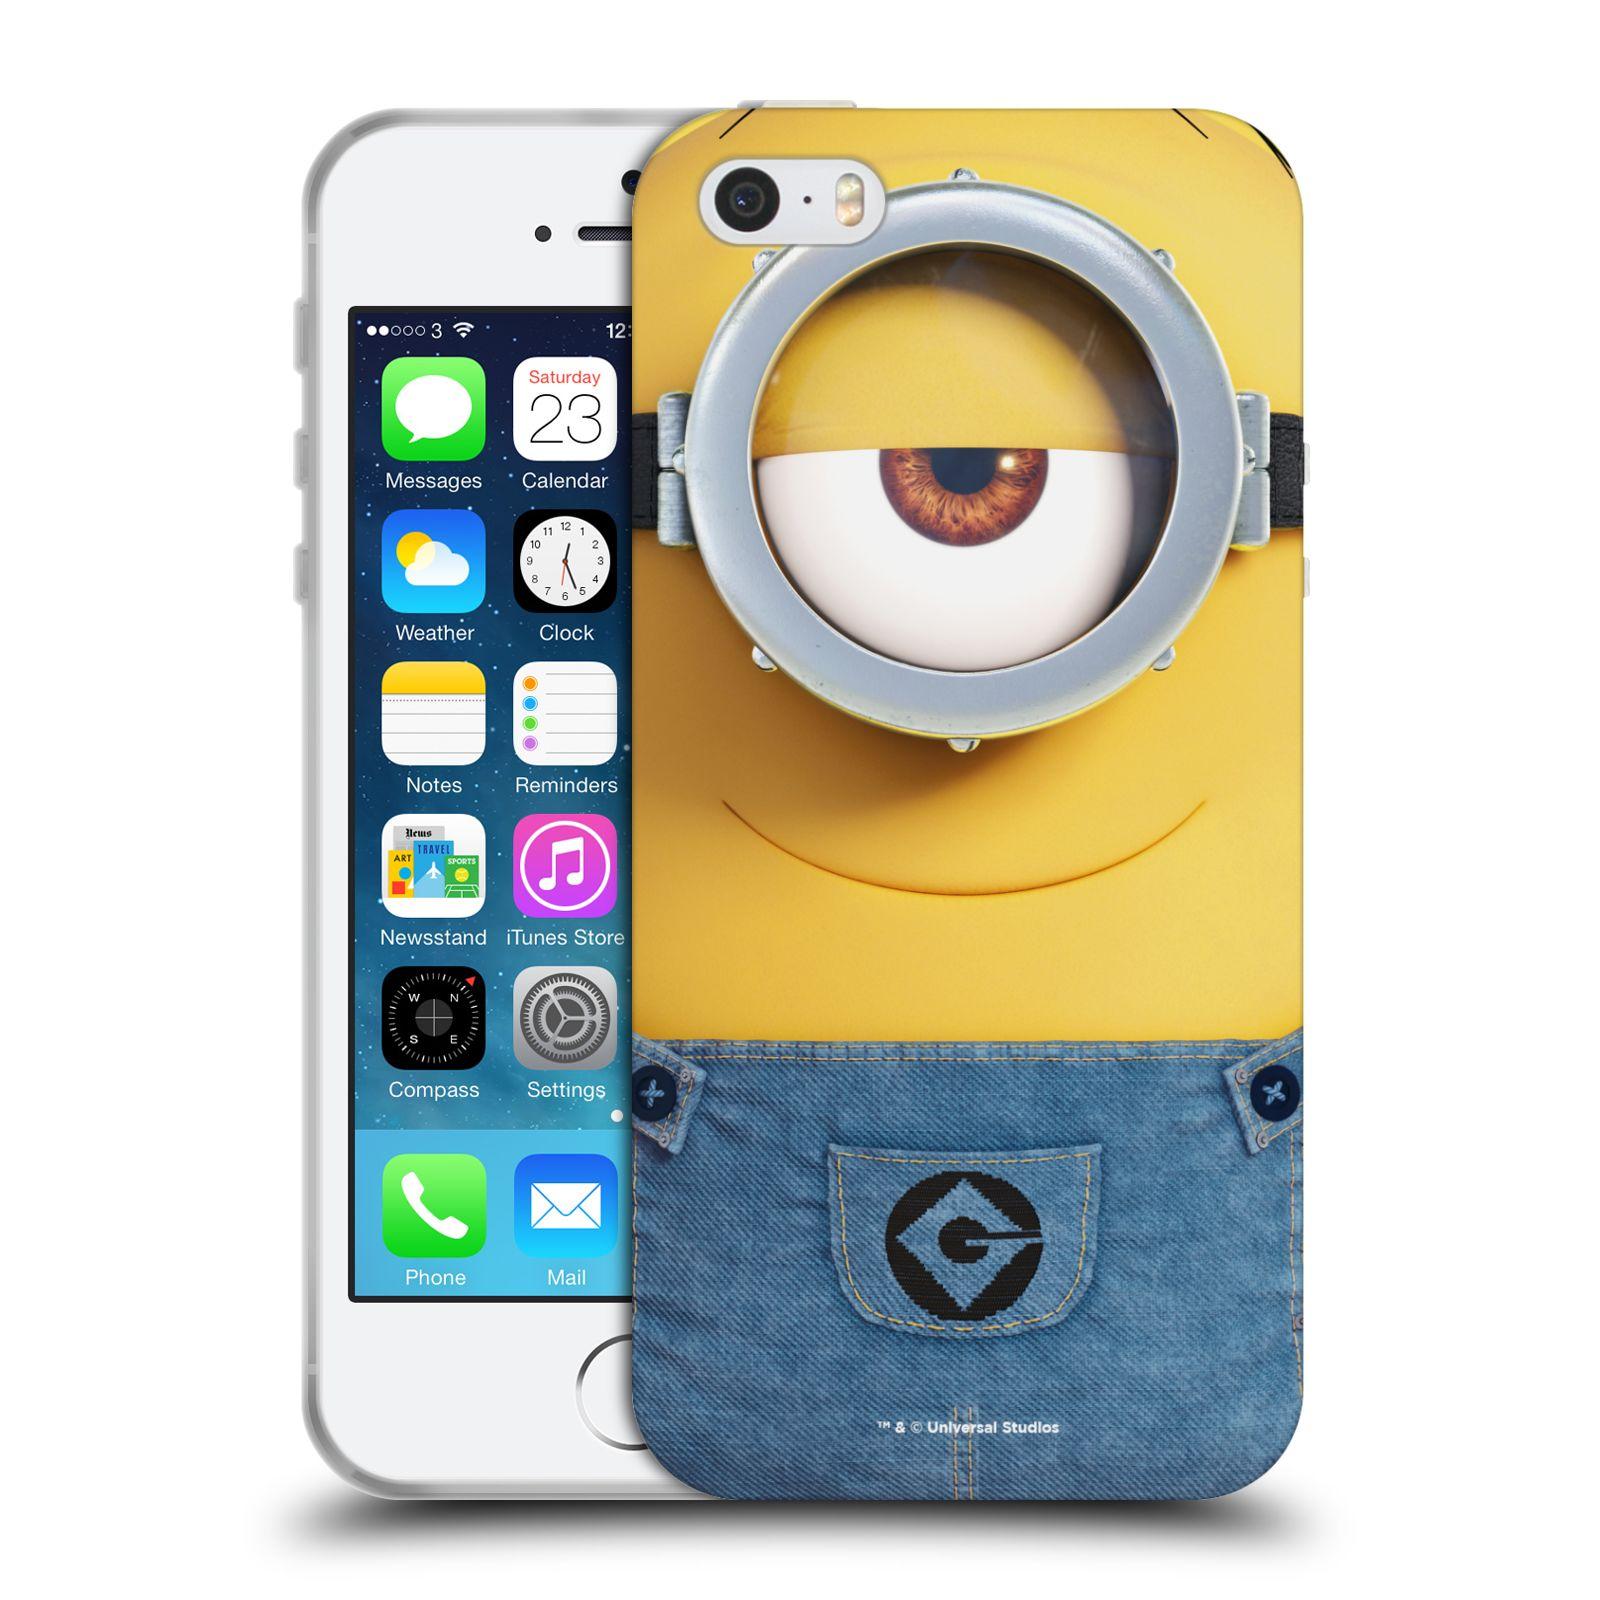 Silikonové pouzdro na mobil Apple iPhone 5, 5S, SE - Head Case - Mimoň Stuart z filmu Já, padouch - Despicable Me